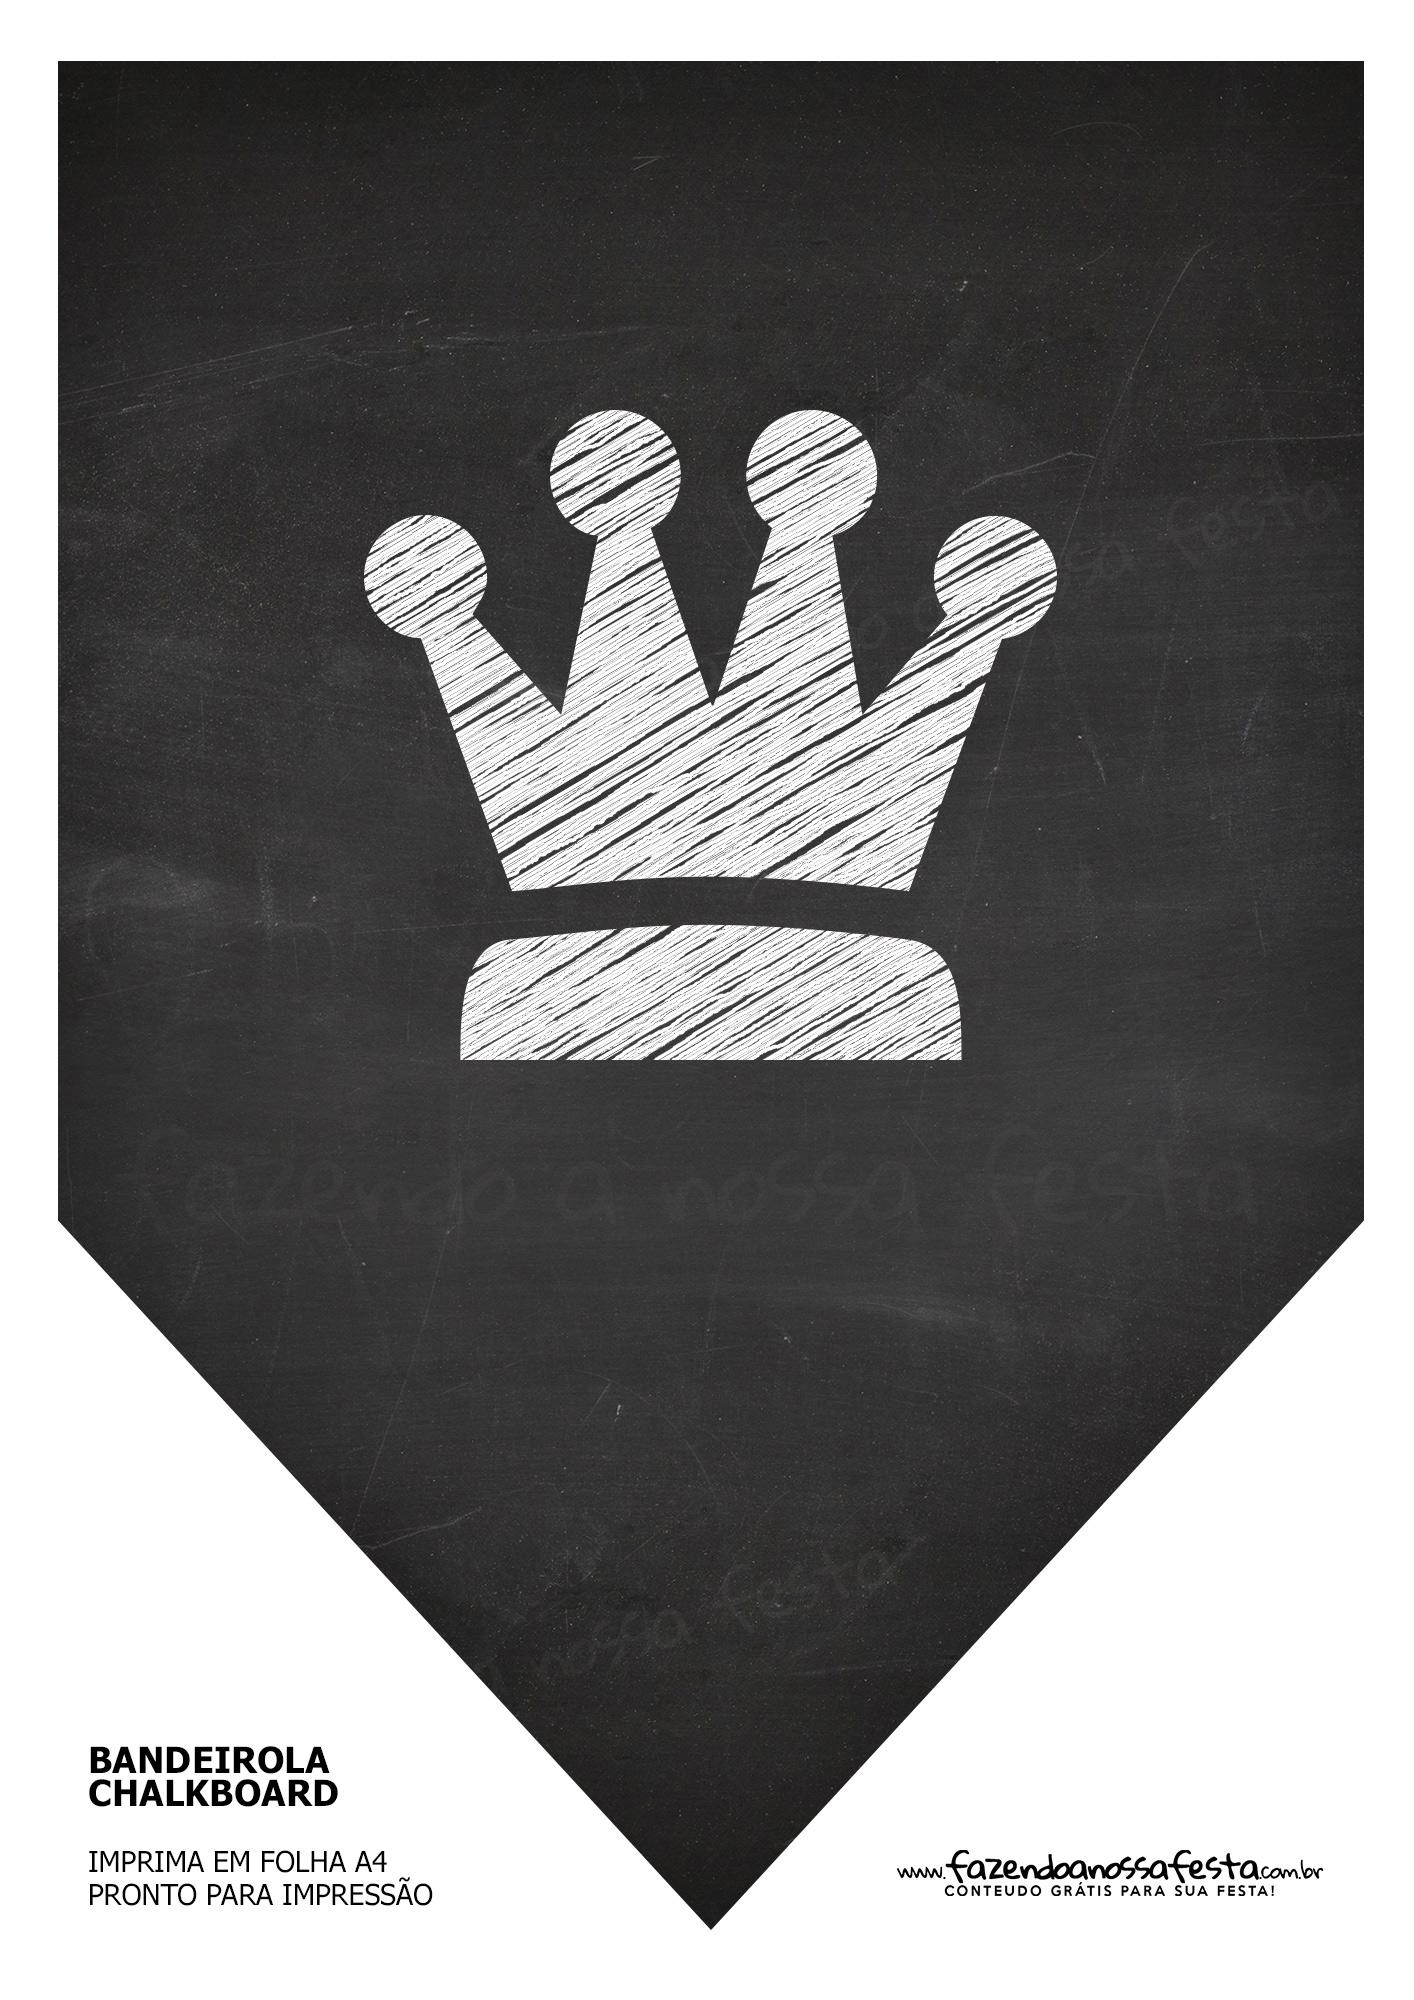 Bandeirinha Chalkboard Coroa